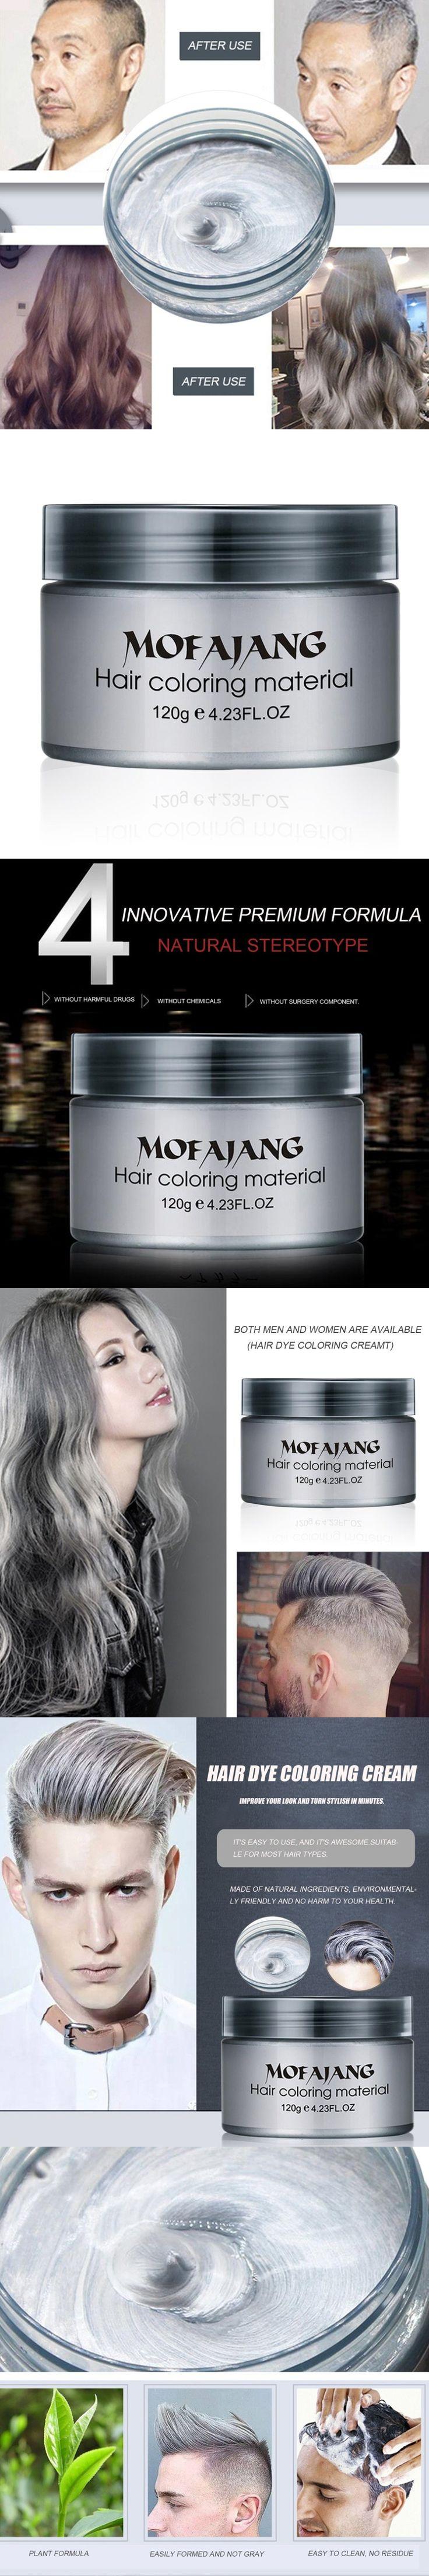 MOFAJANG Salon Hair Styling Pomade Silver Ash Grandma Grey Hair Waxes Temporary Disposable Hair Dye Coloring Mud Cream Unisex